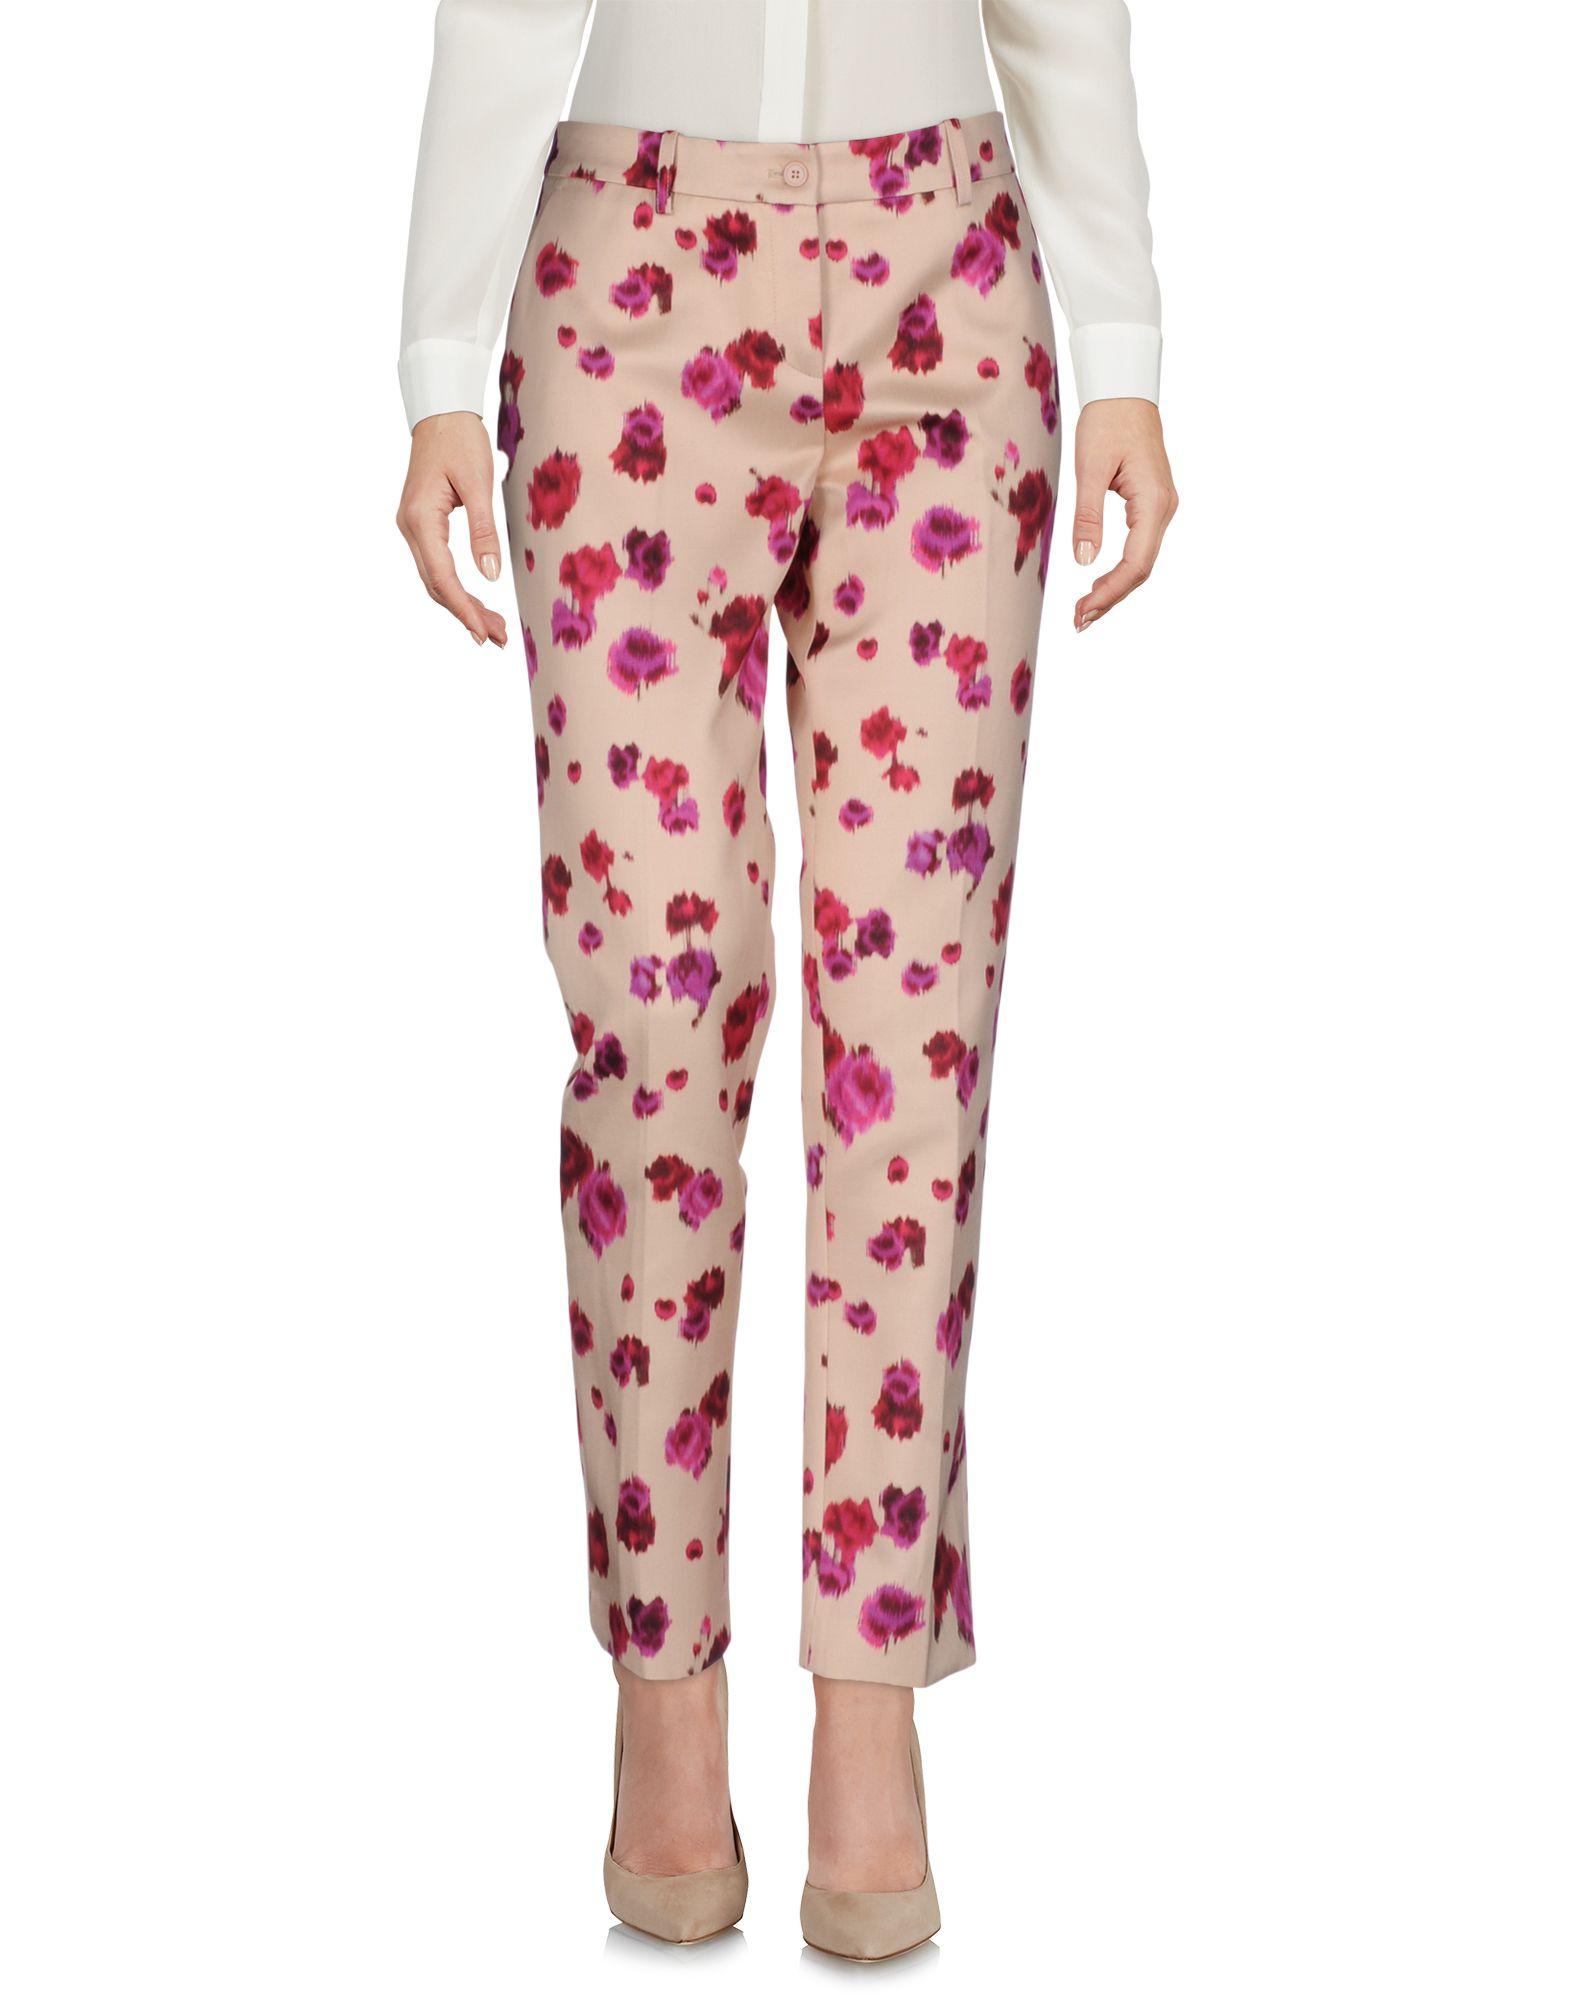 Pantalone Michael Kors Donna - Acquista online su Jtsk0